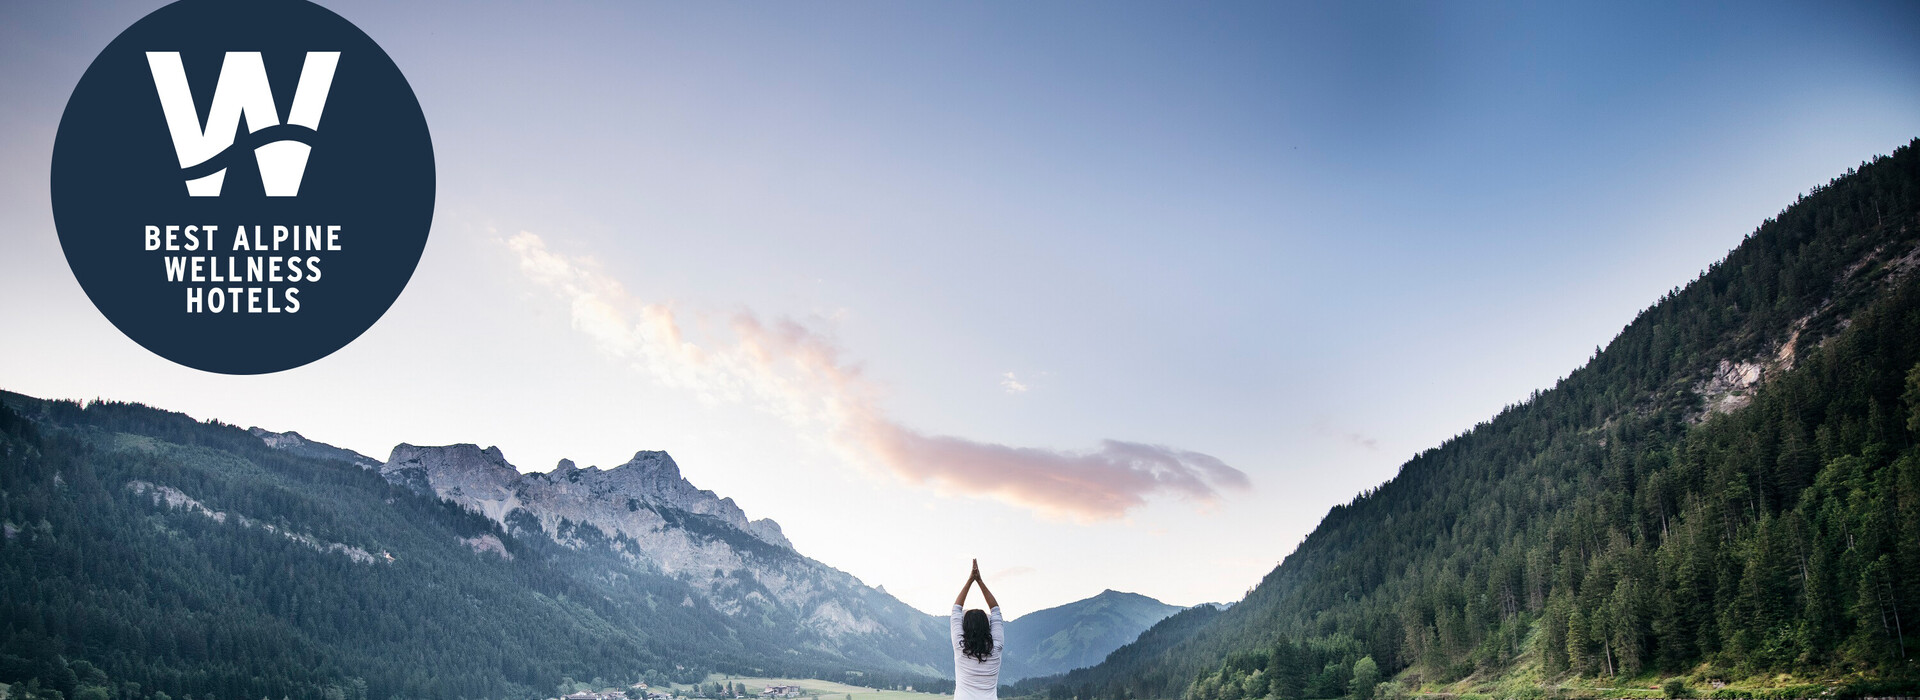 Best Alpine Wellness Hotels - Frau auf Steg am See bei Sonnengruß